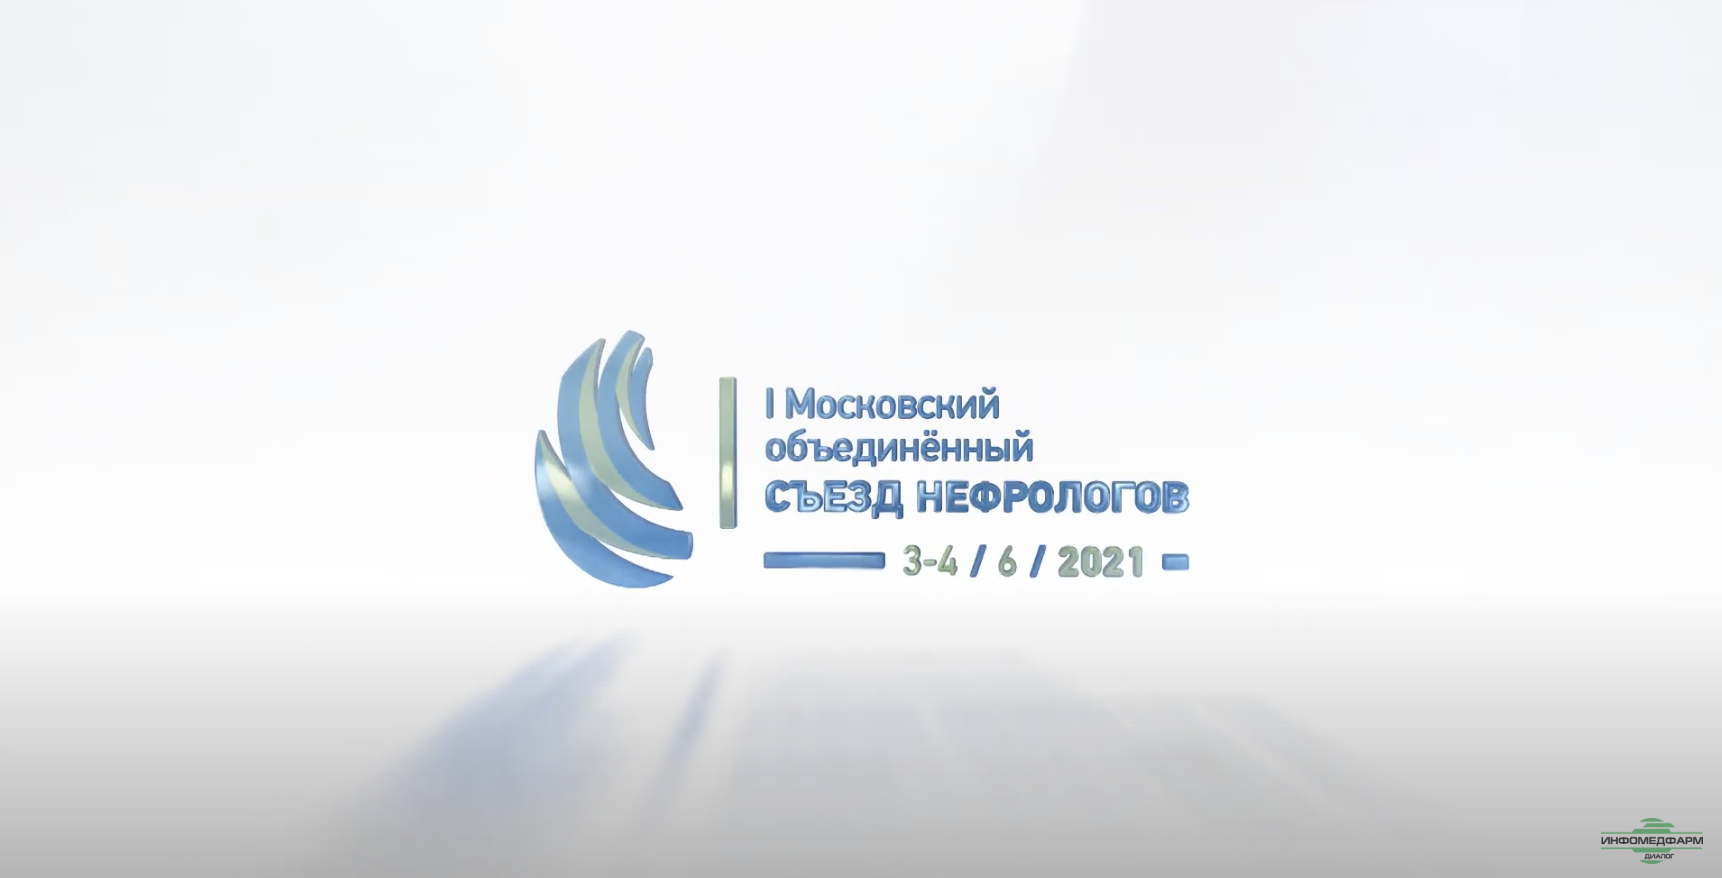 I Московский объединённый съезд нефрологов 3-4/06/ 2021